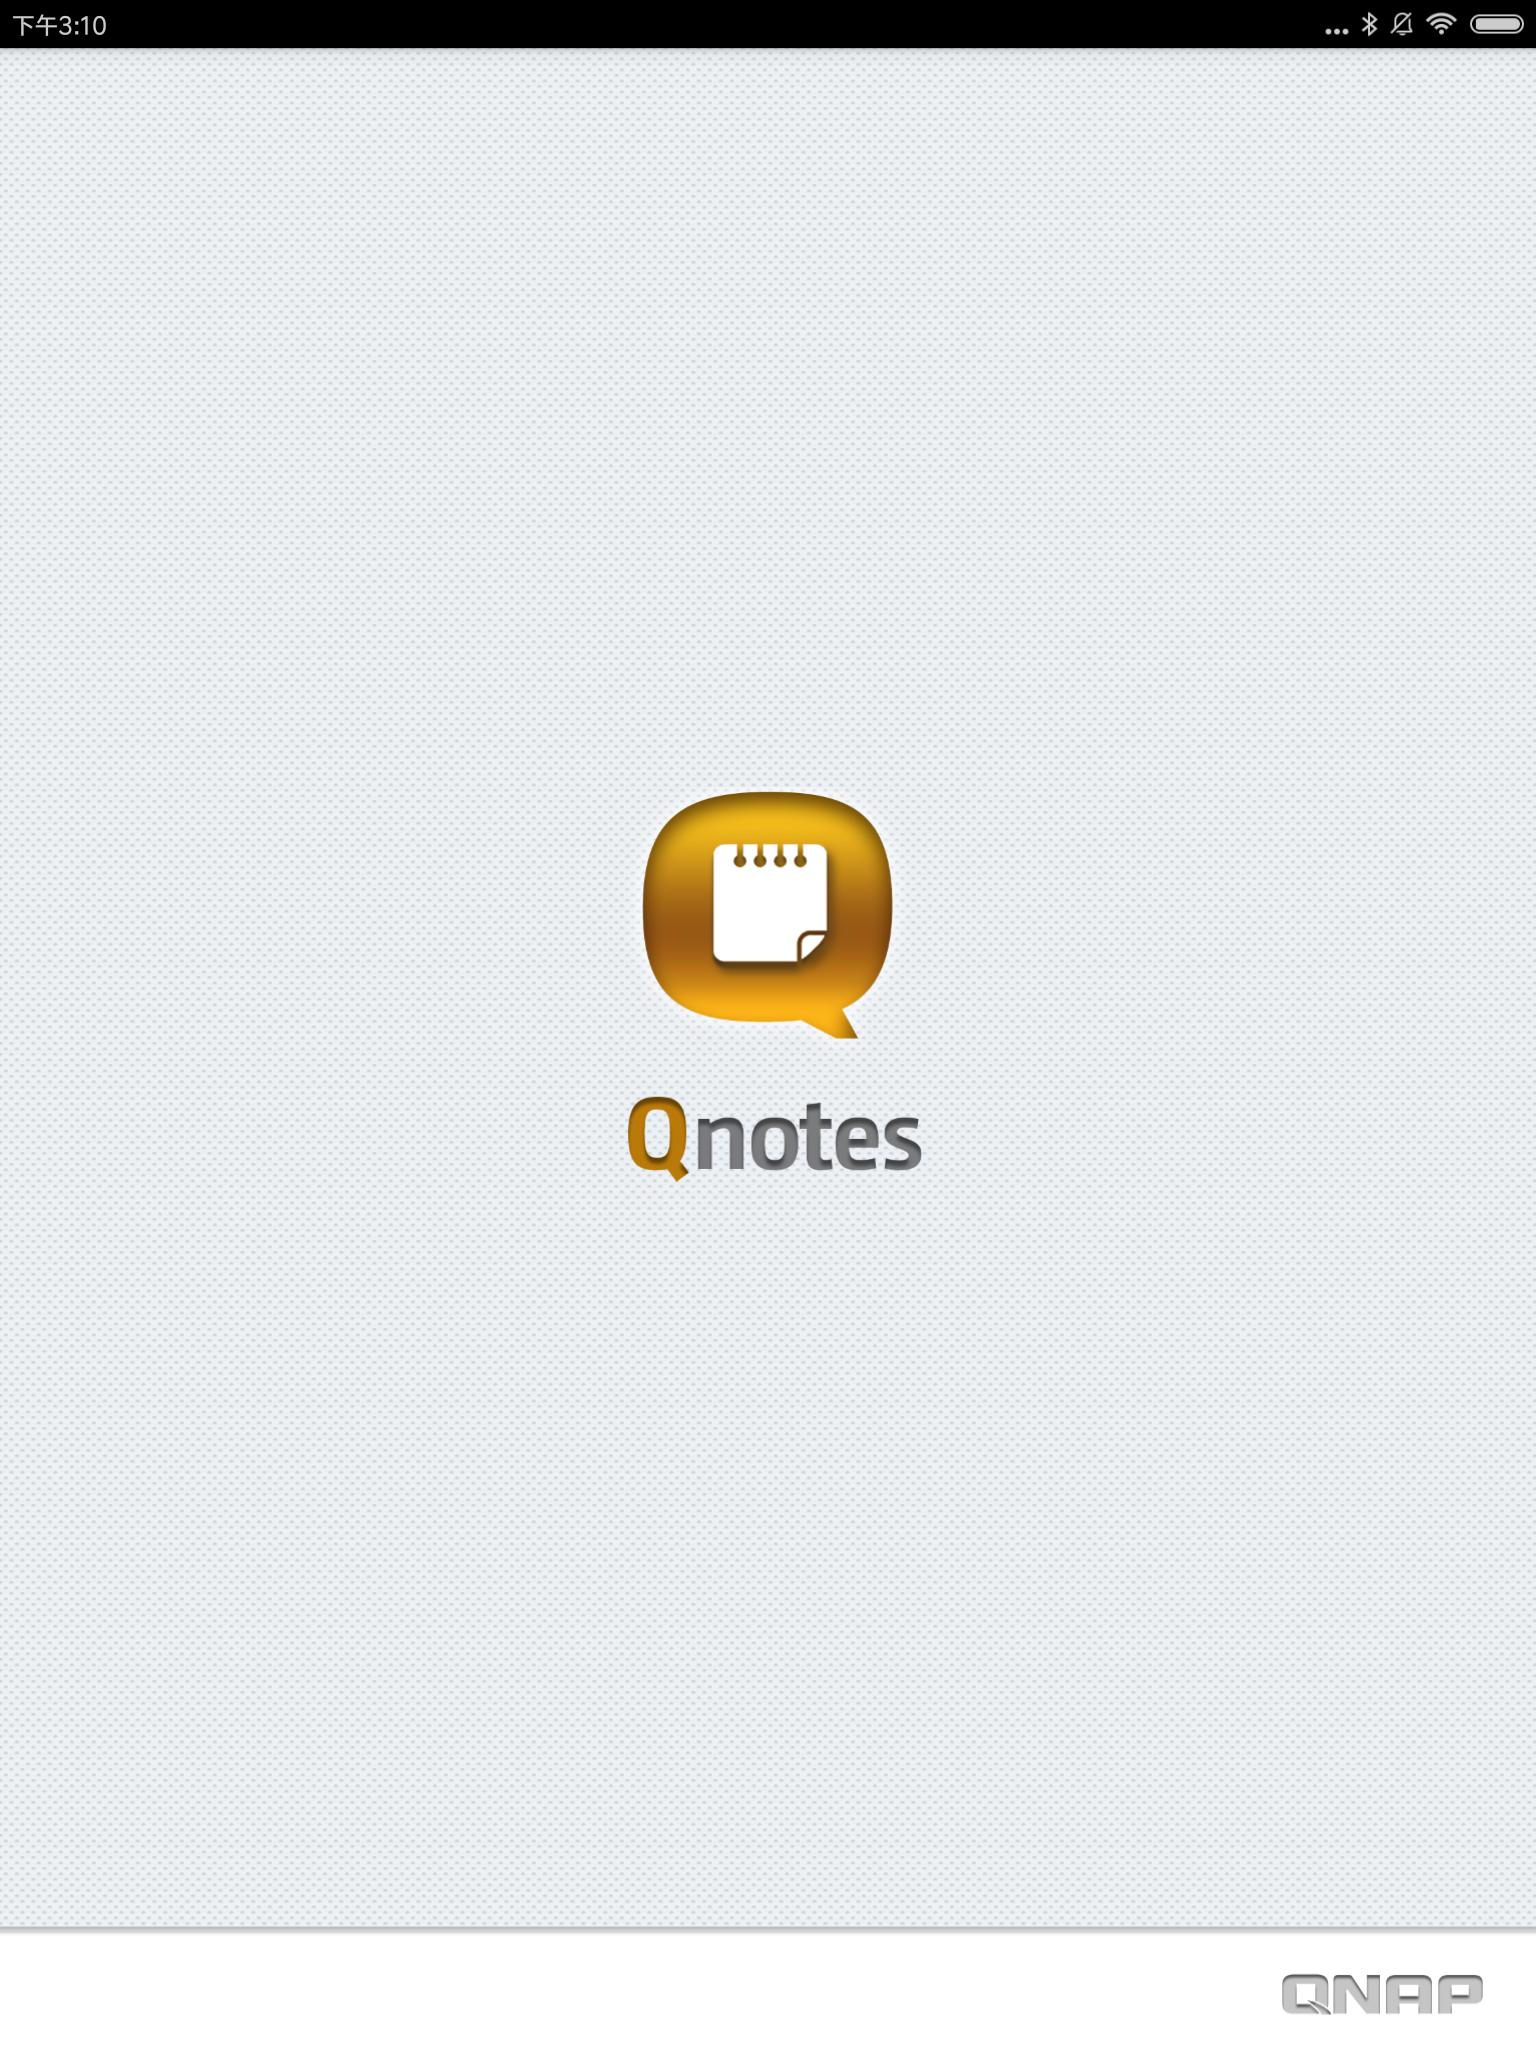 QnotesHD